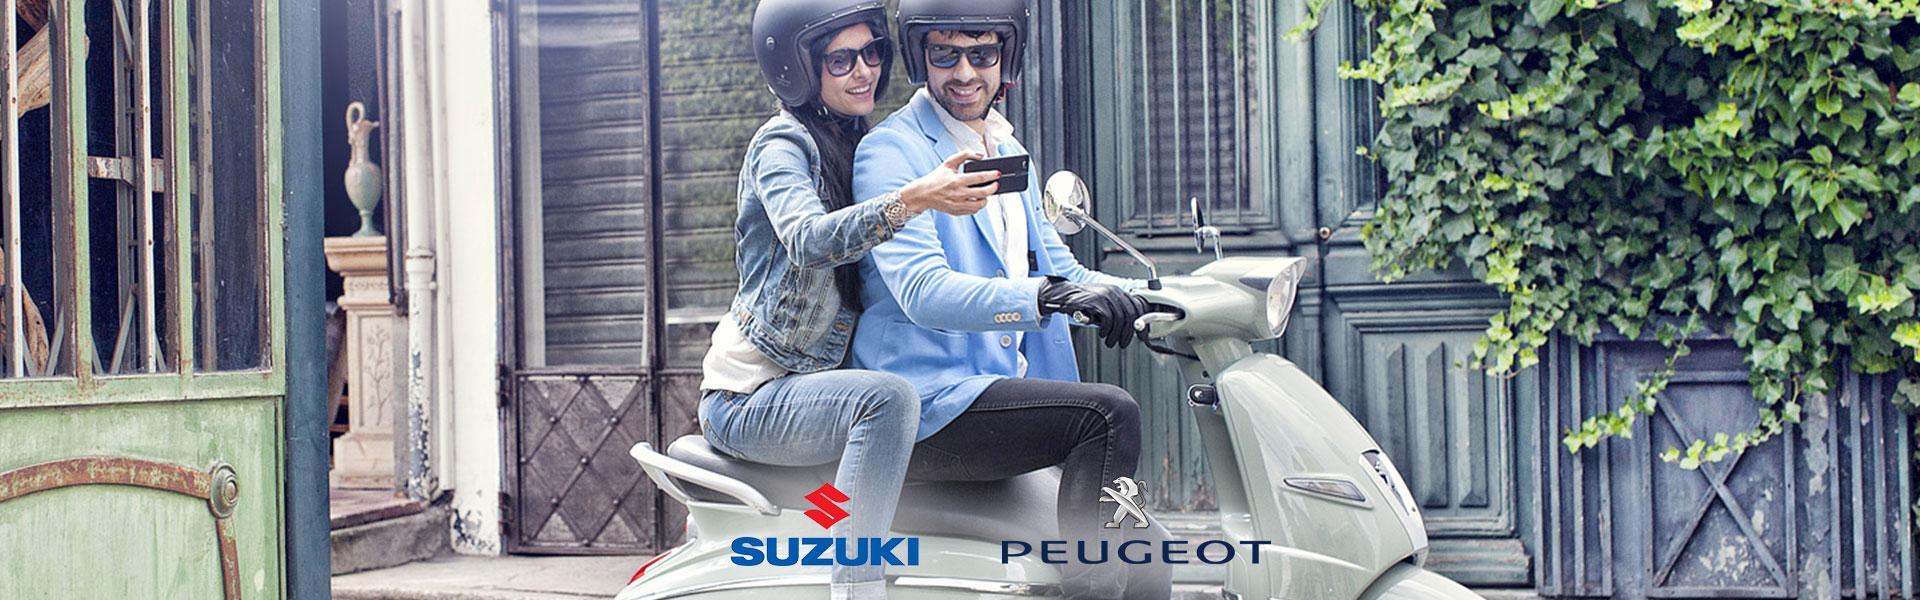 Vendita Scooter Peujeot e Suzuki